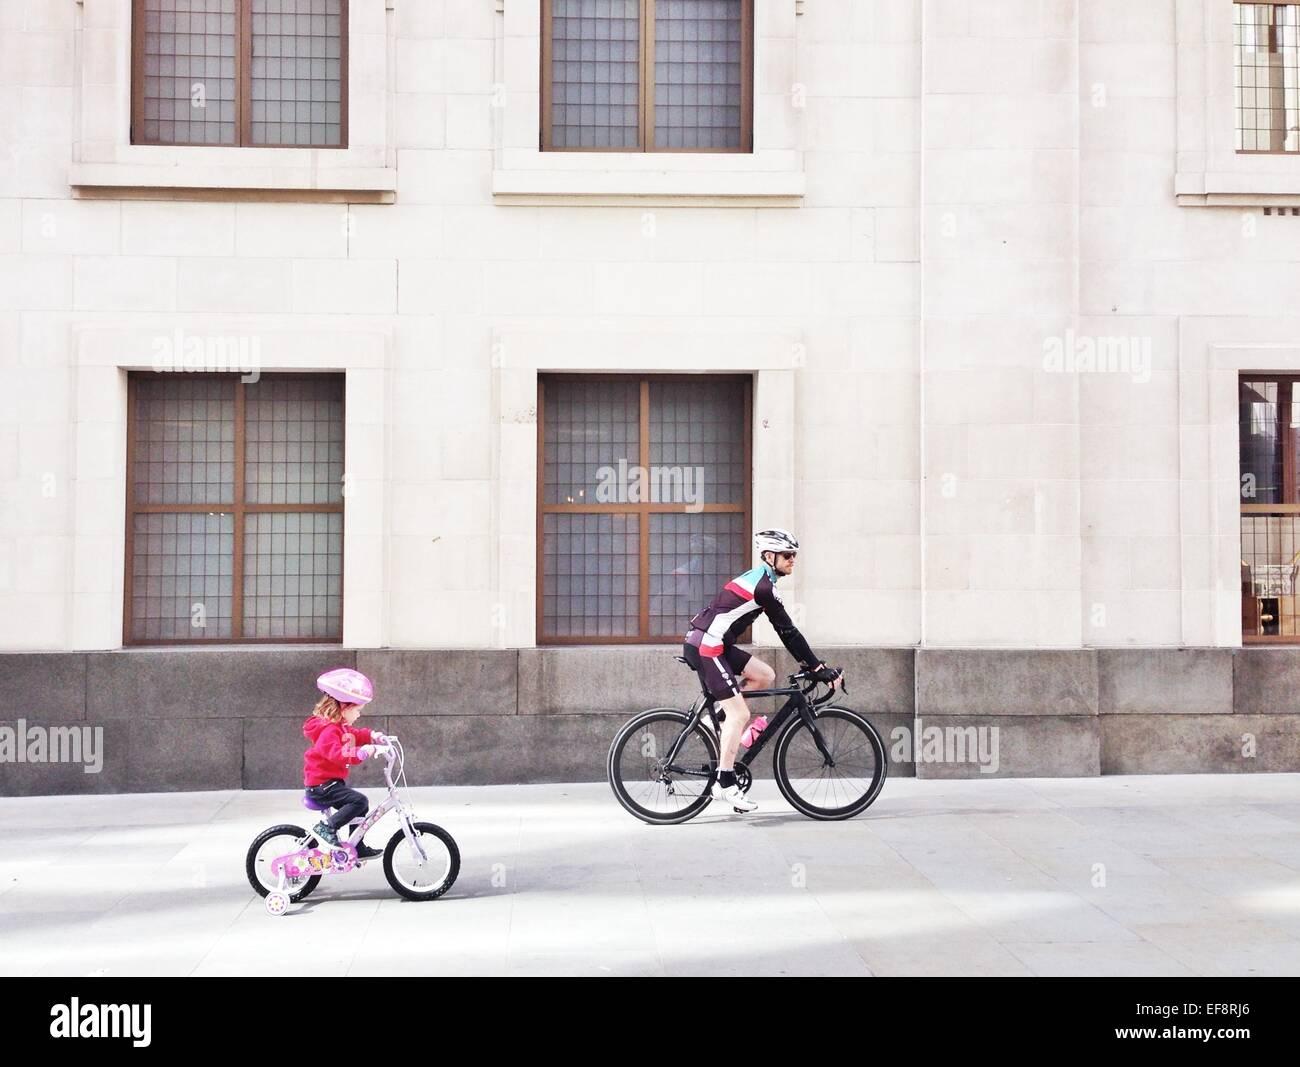 Reino Unido, Inglaterra, Londres, padre e hija ciclismo edificio pasado Imagen De Stock